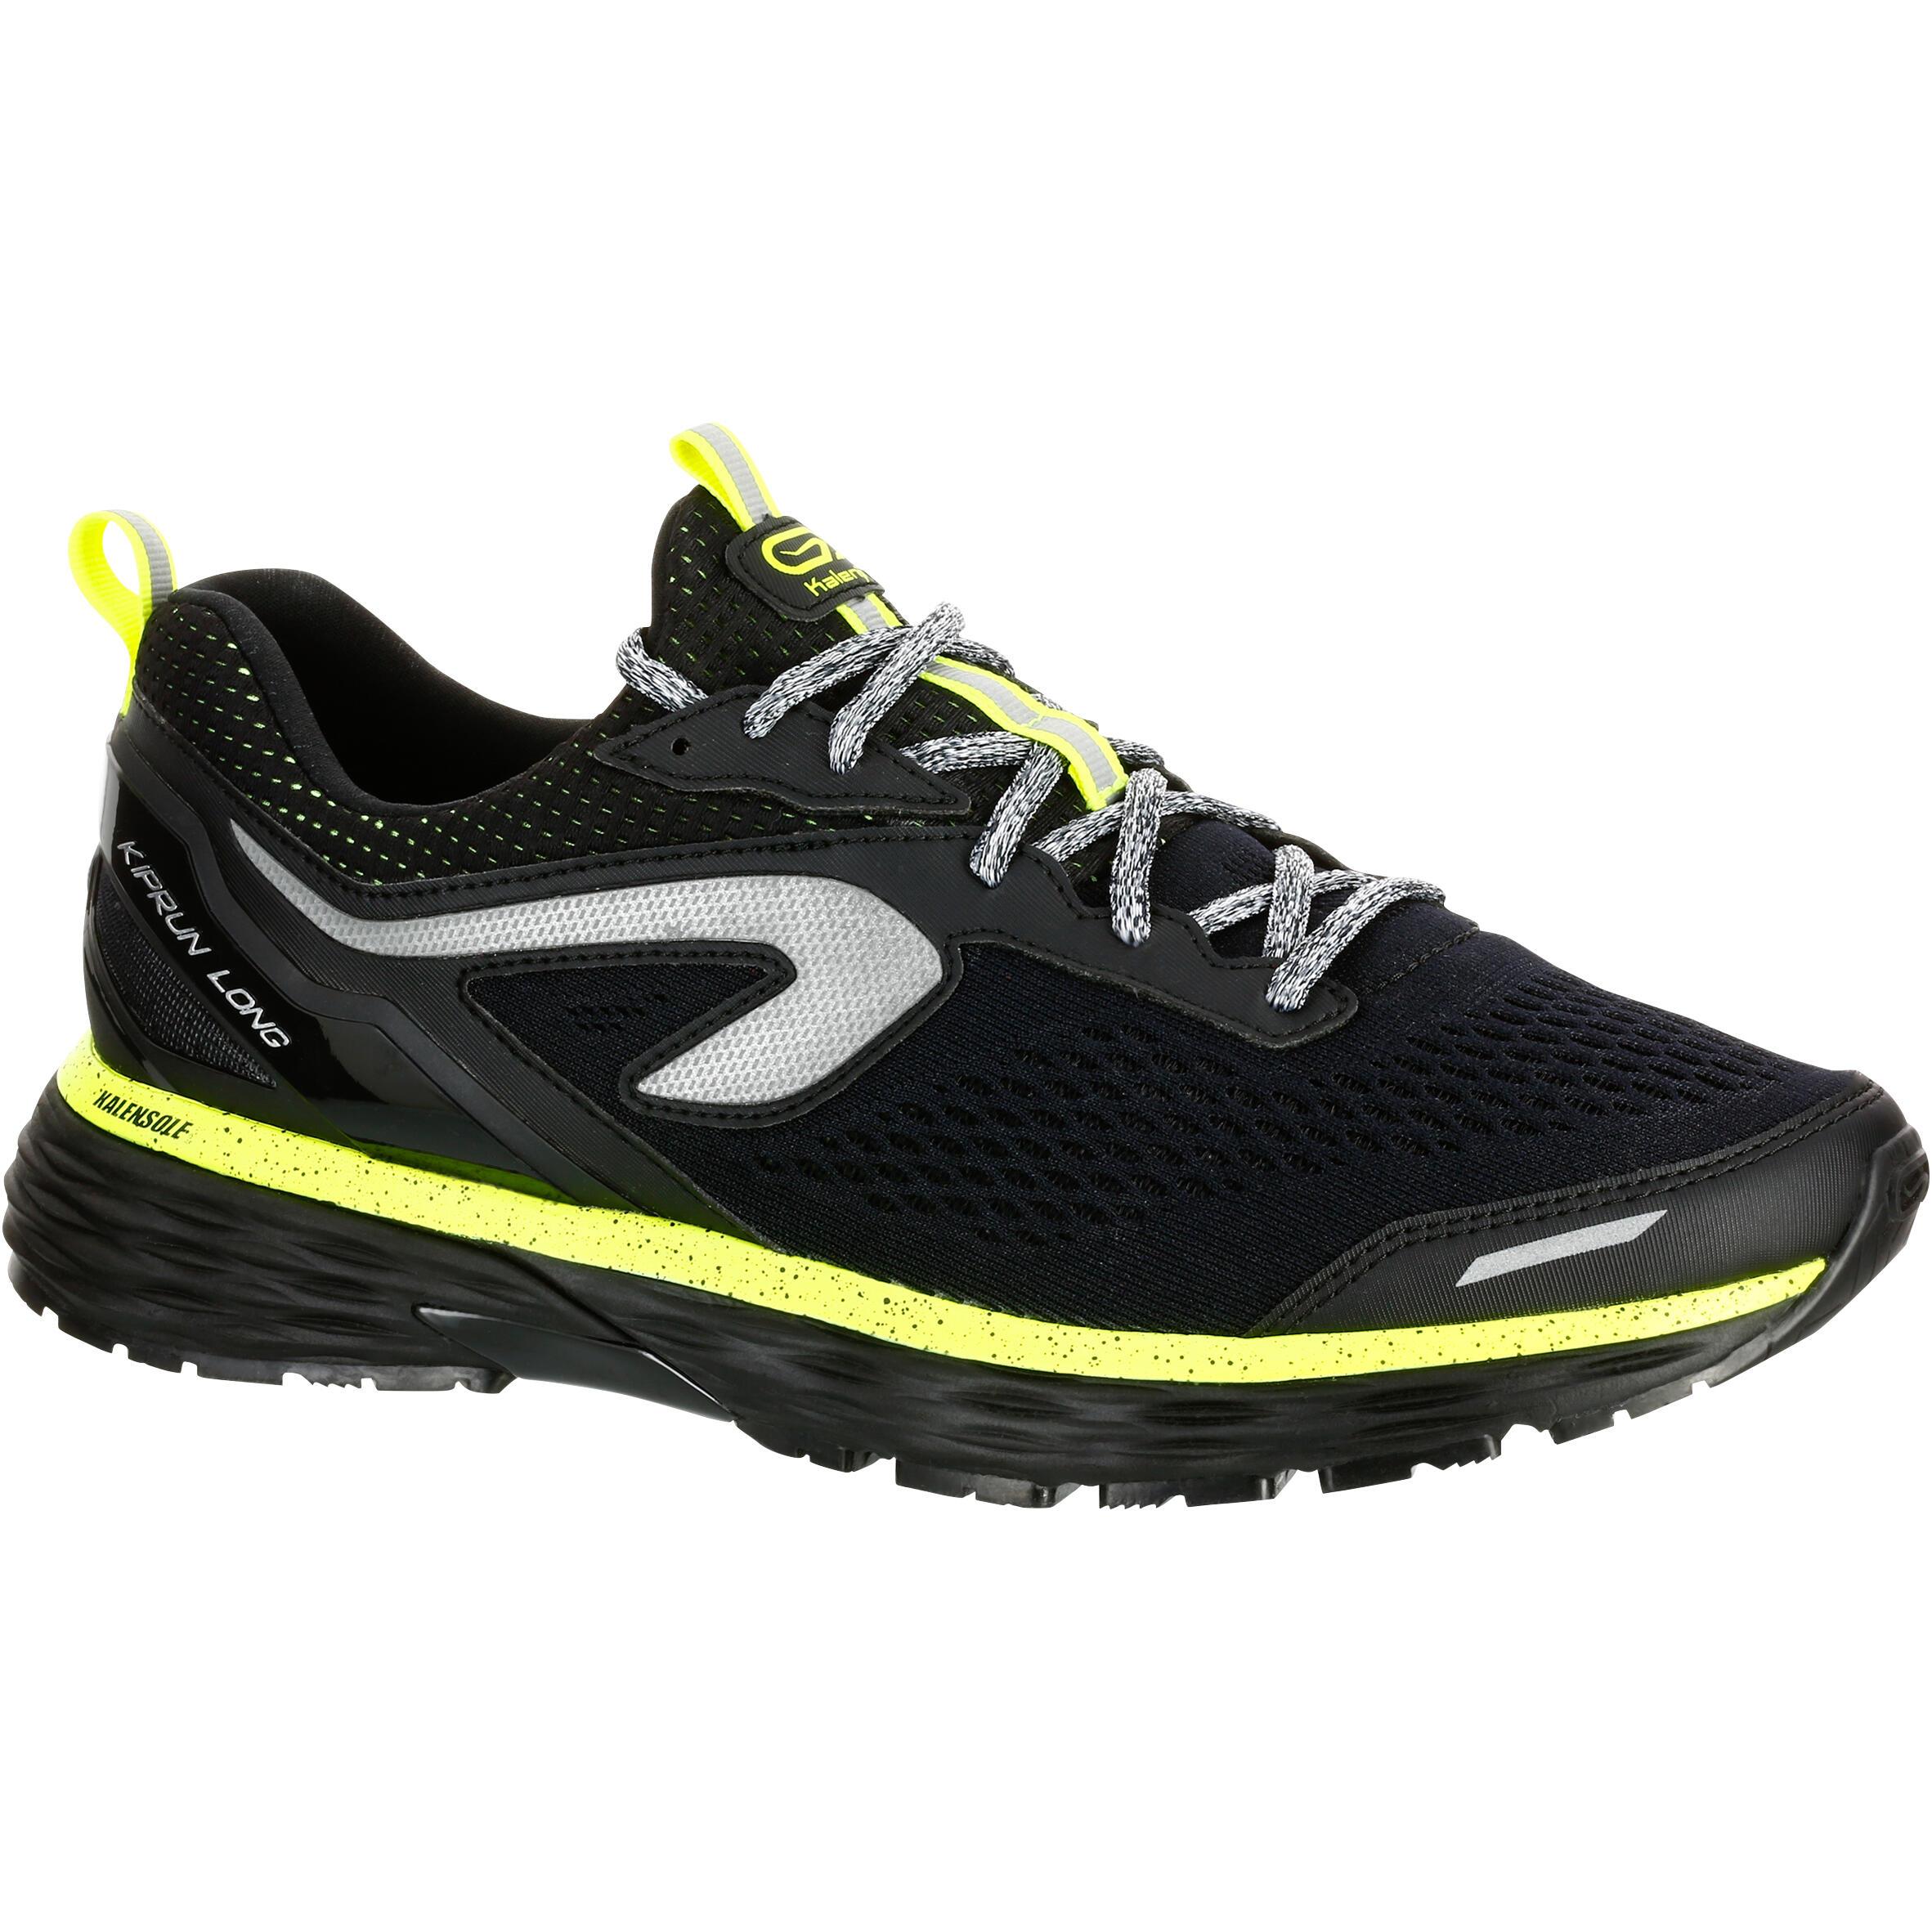 eab6ba9826b Chaussures running Hommes